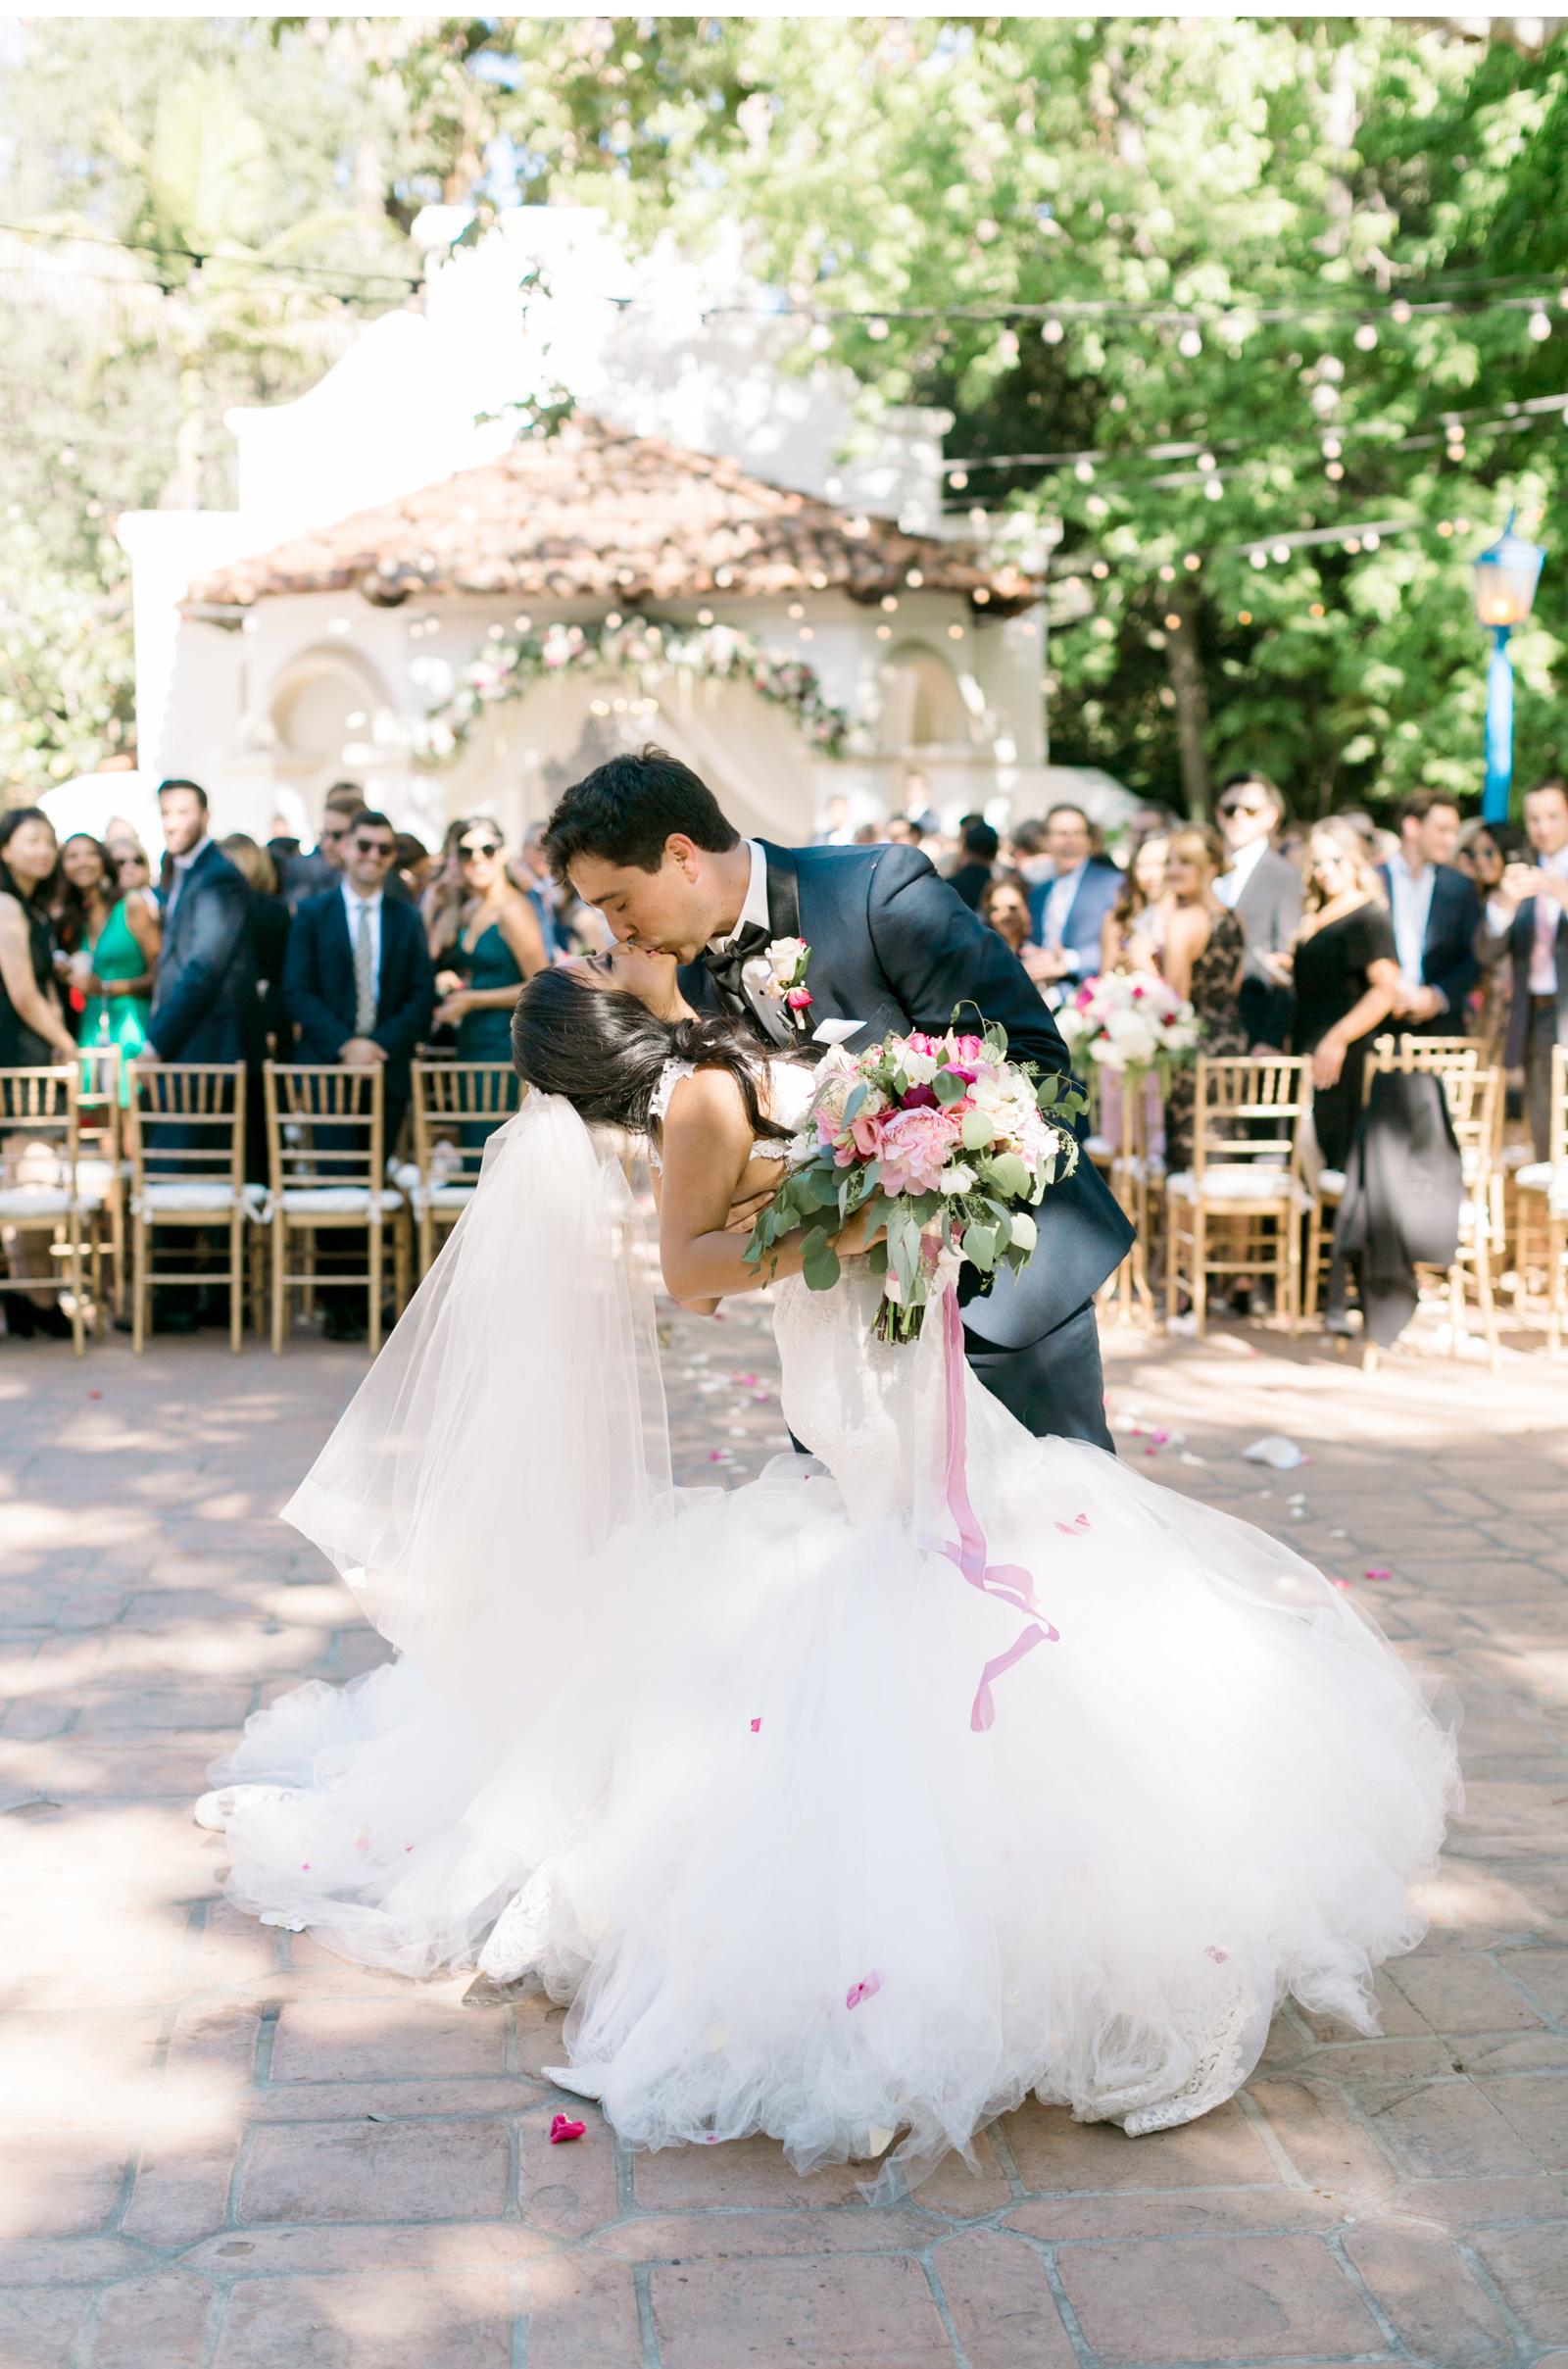 Malibu-Wedding-Triunfo-Creek-Natalie-Schutt-Photography_02.jpg